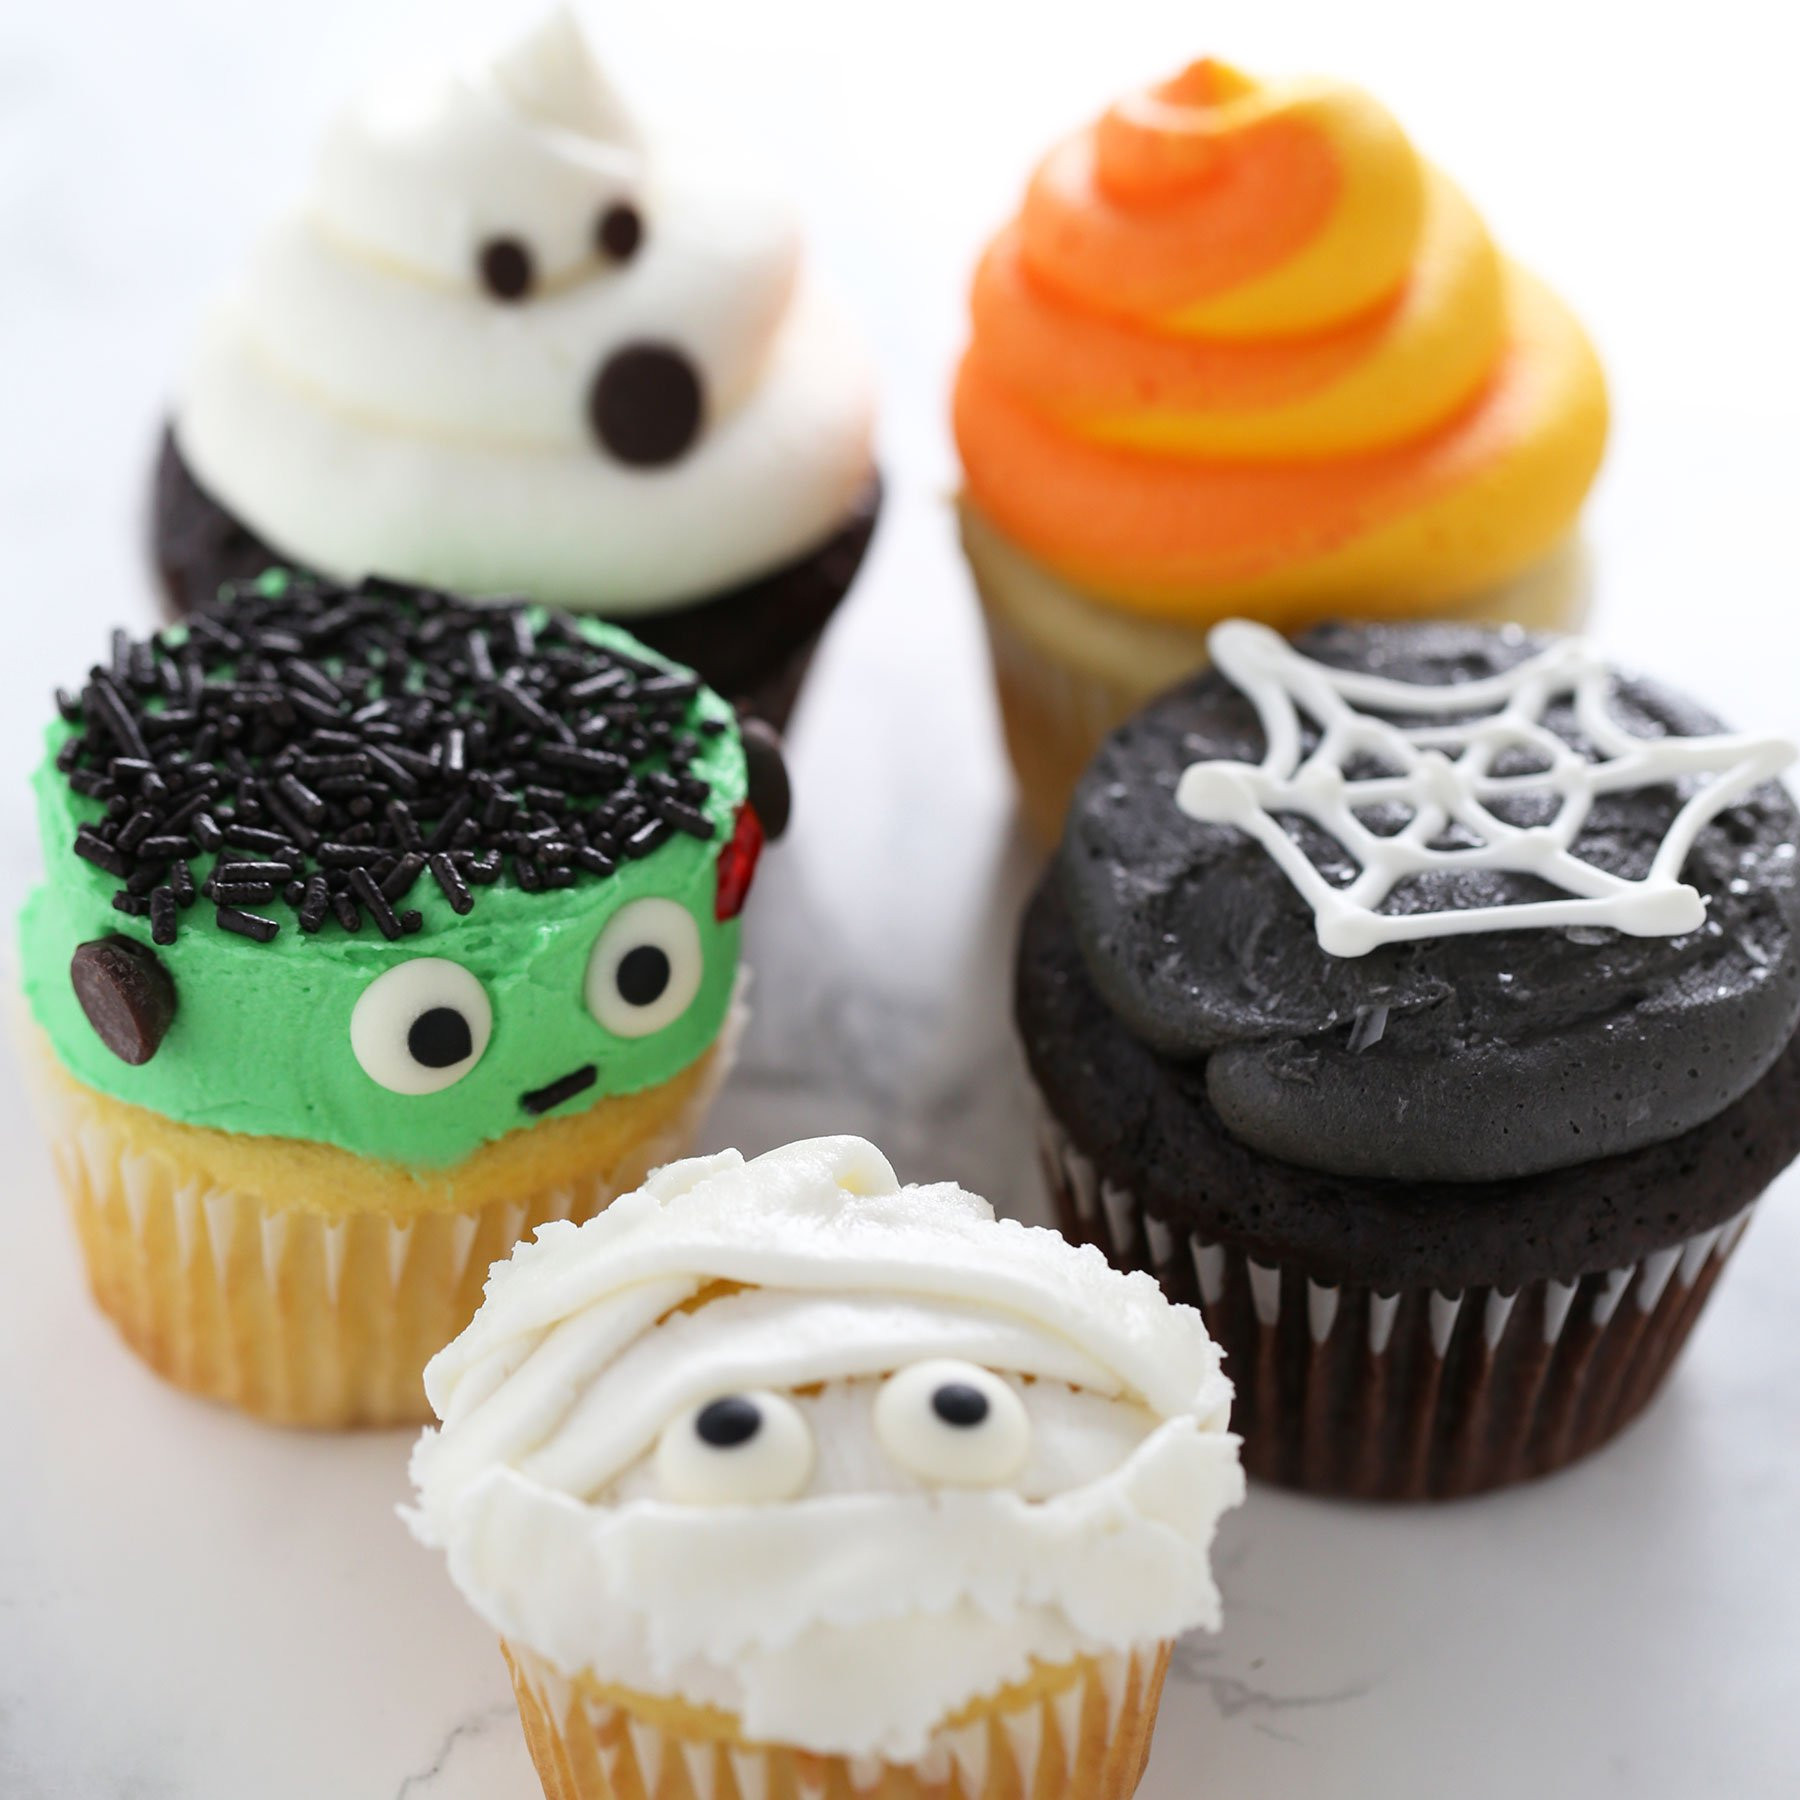 Funny Halloween Cupcakes  How to Make Halloween Cupcakes Handle the Heat